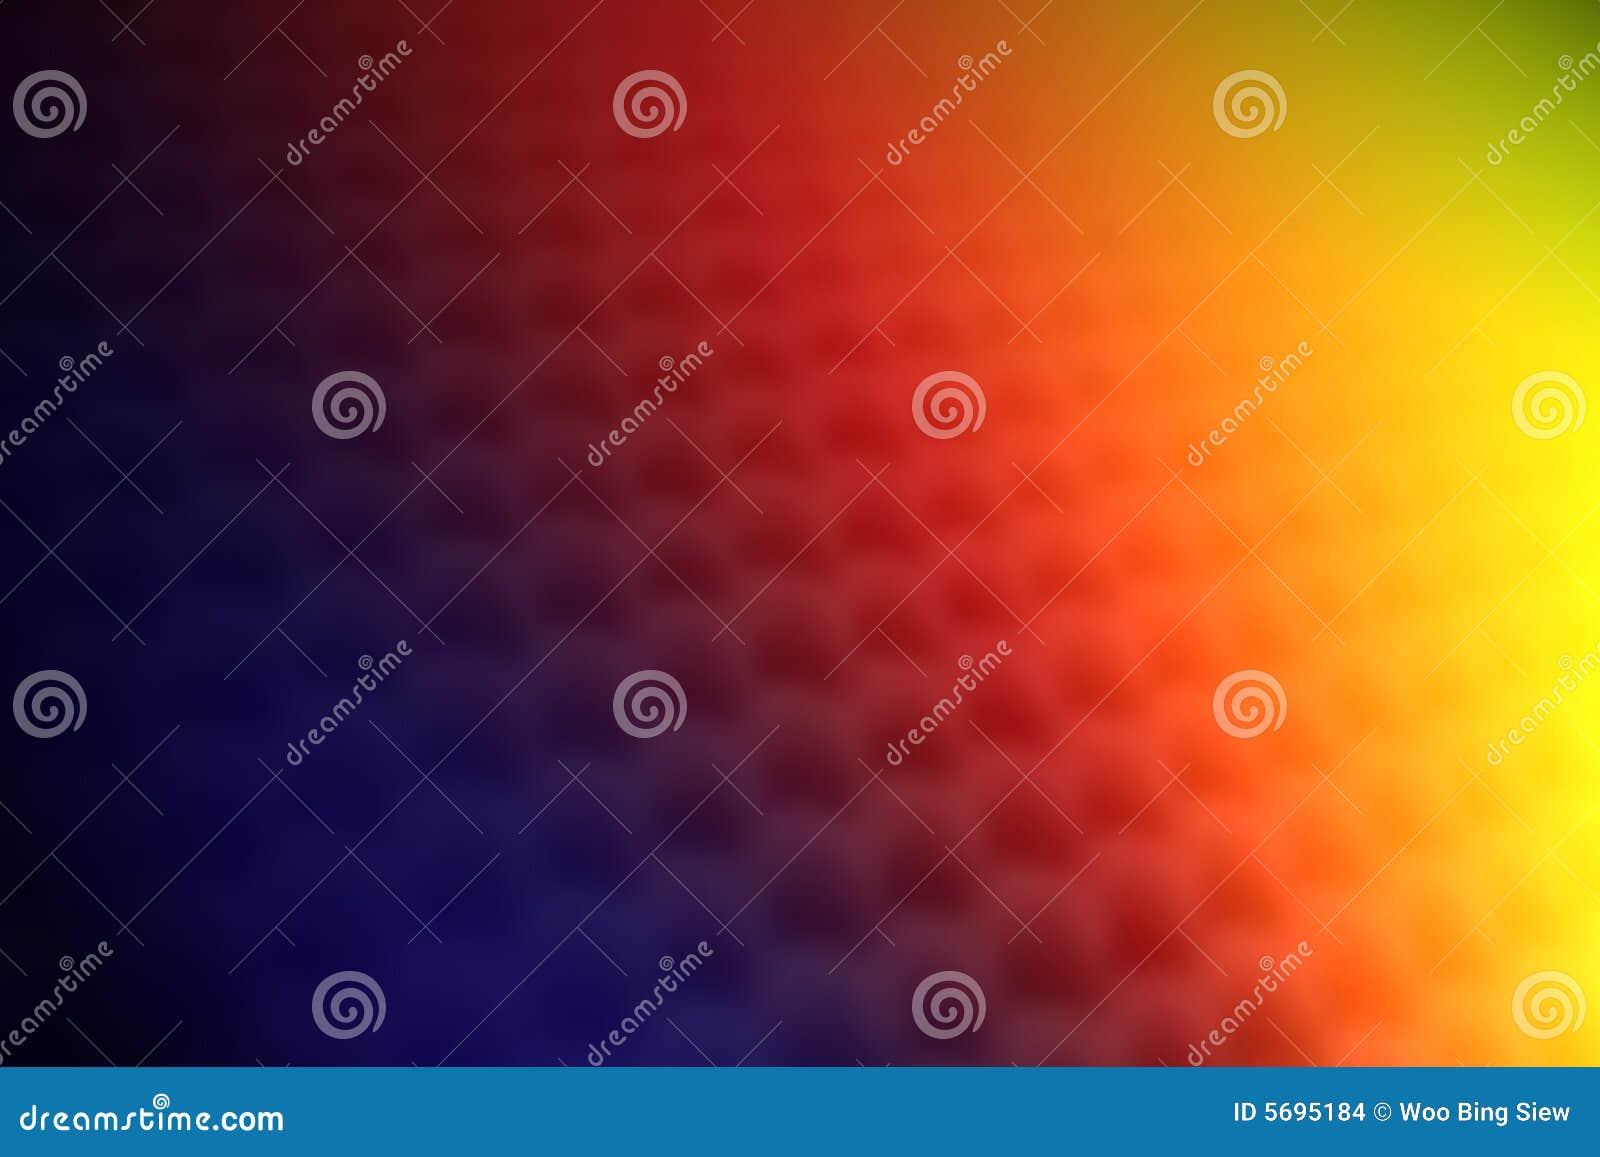 O arco-íris colore o fundo da textura